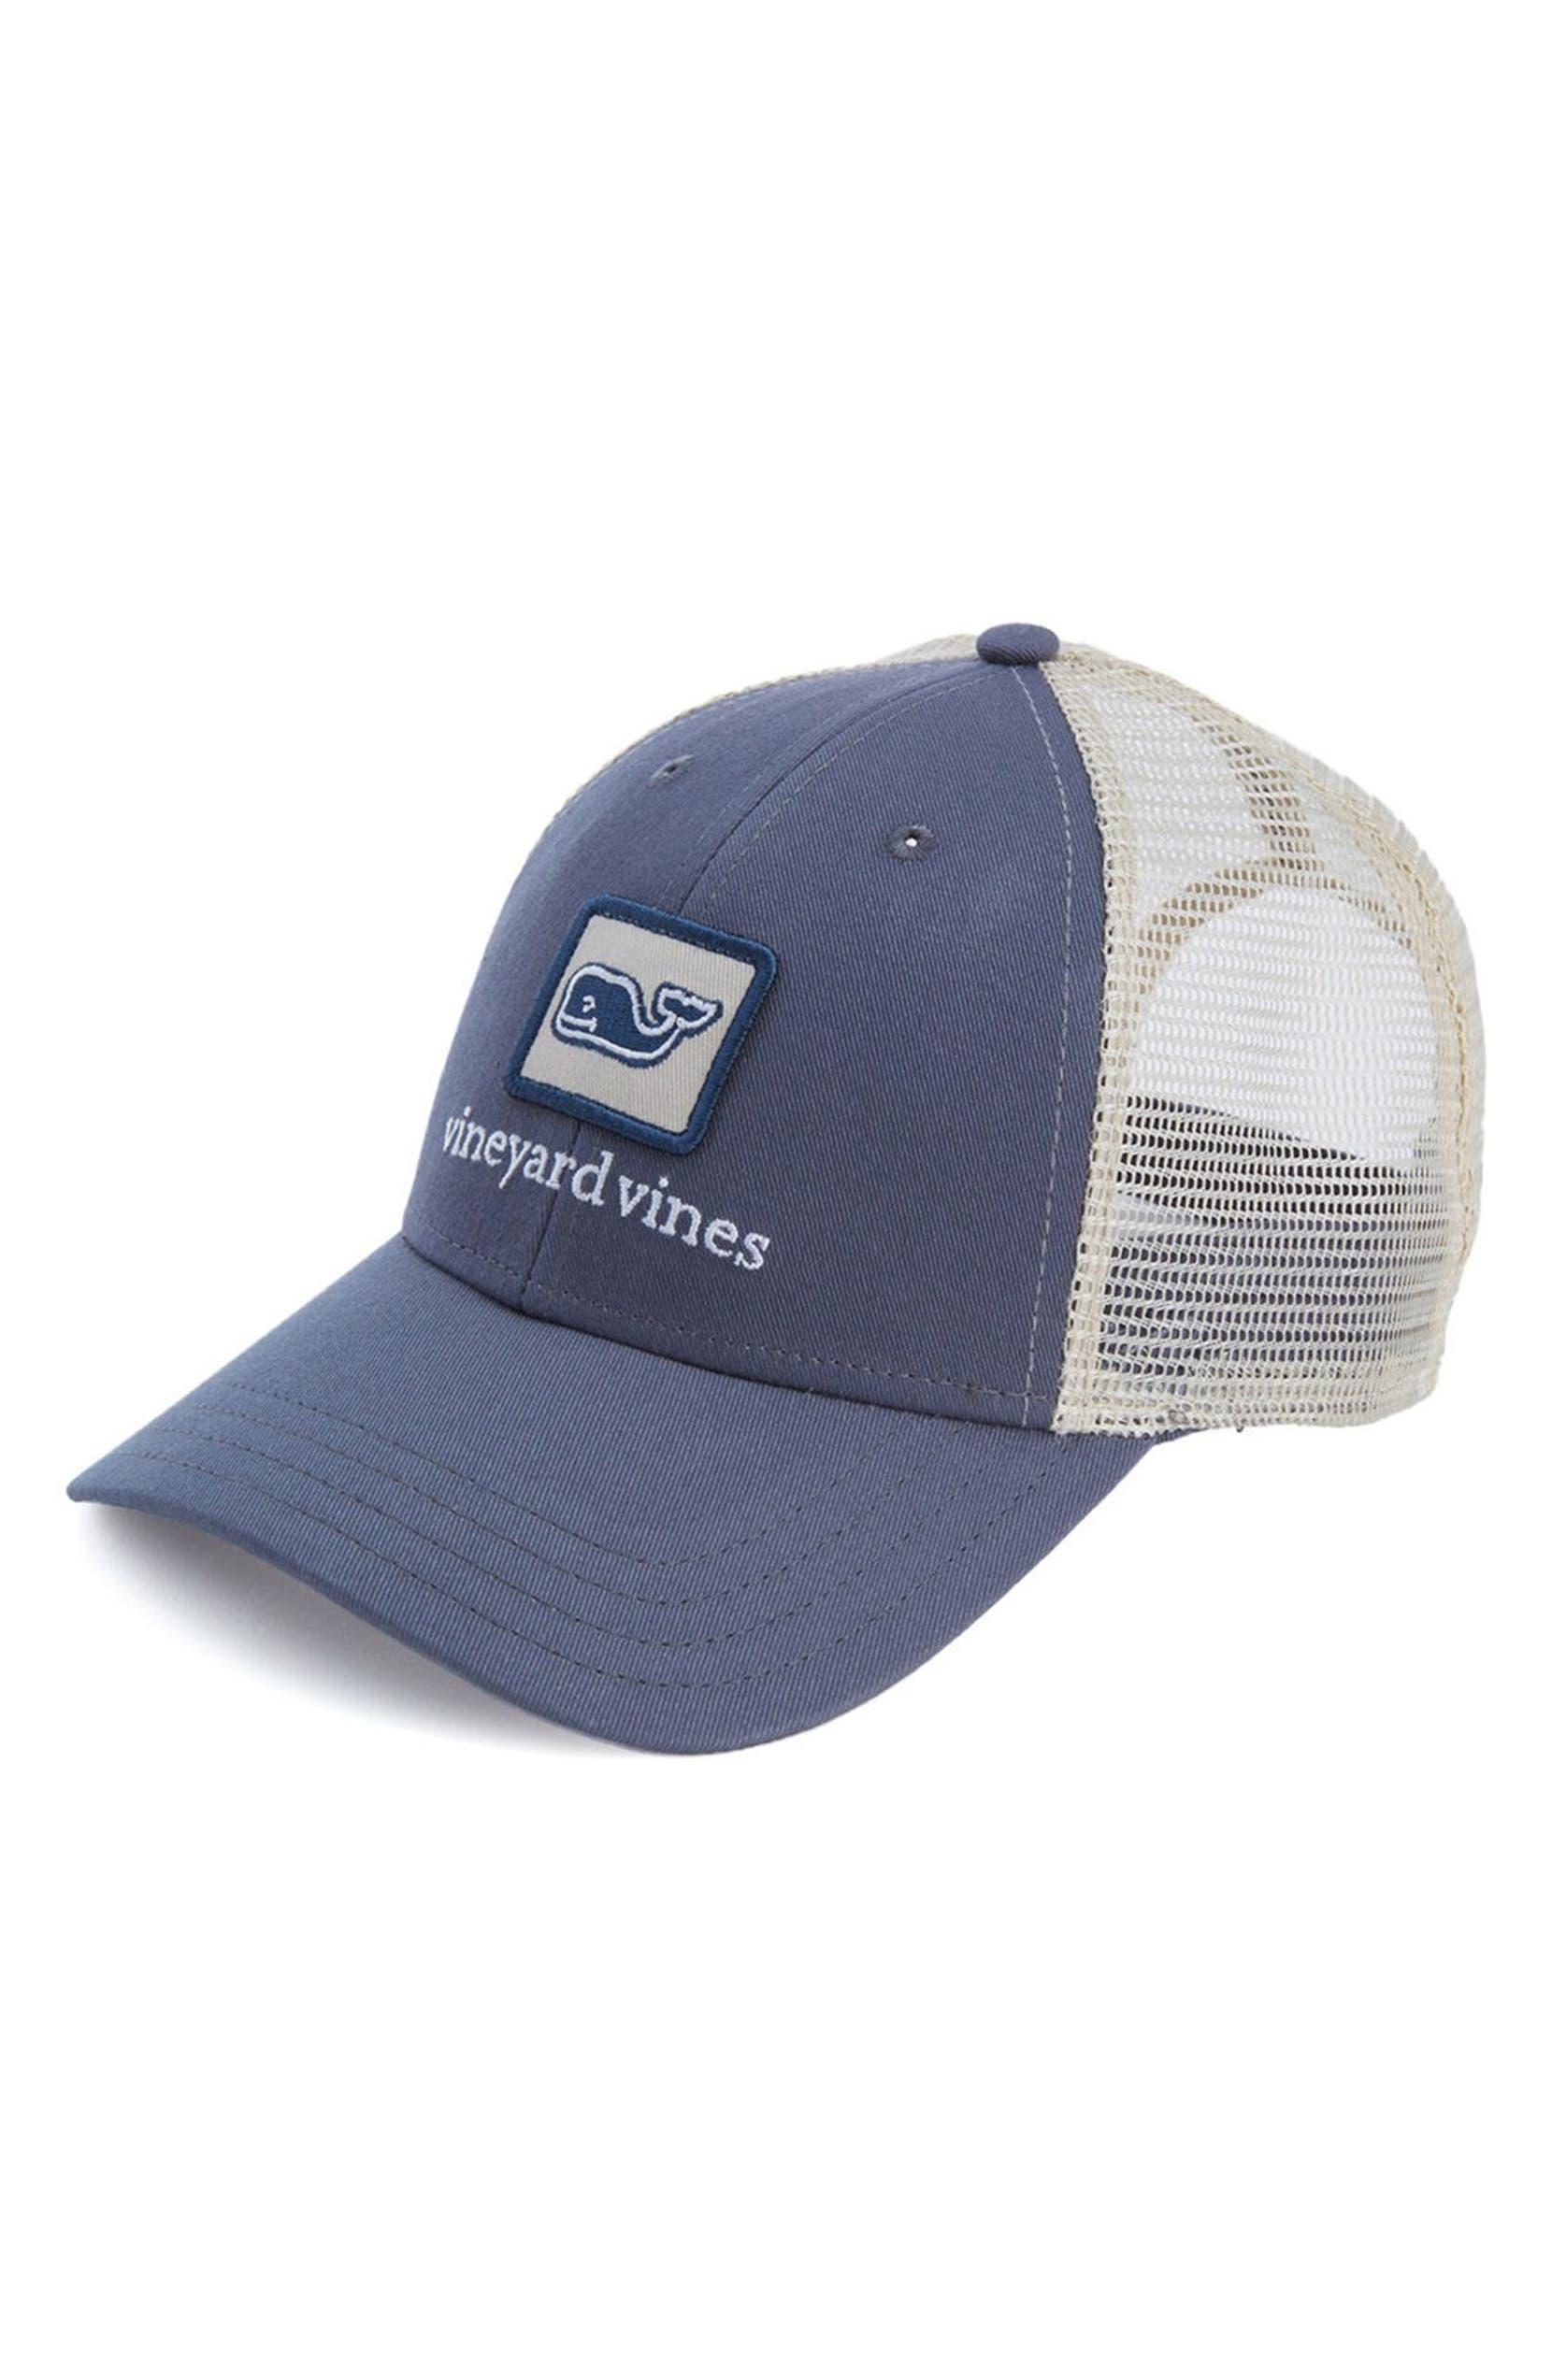 918b71eb31b vineyard vines Whale Patch Trucker Hat